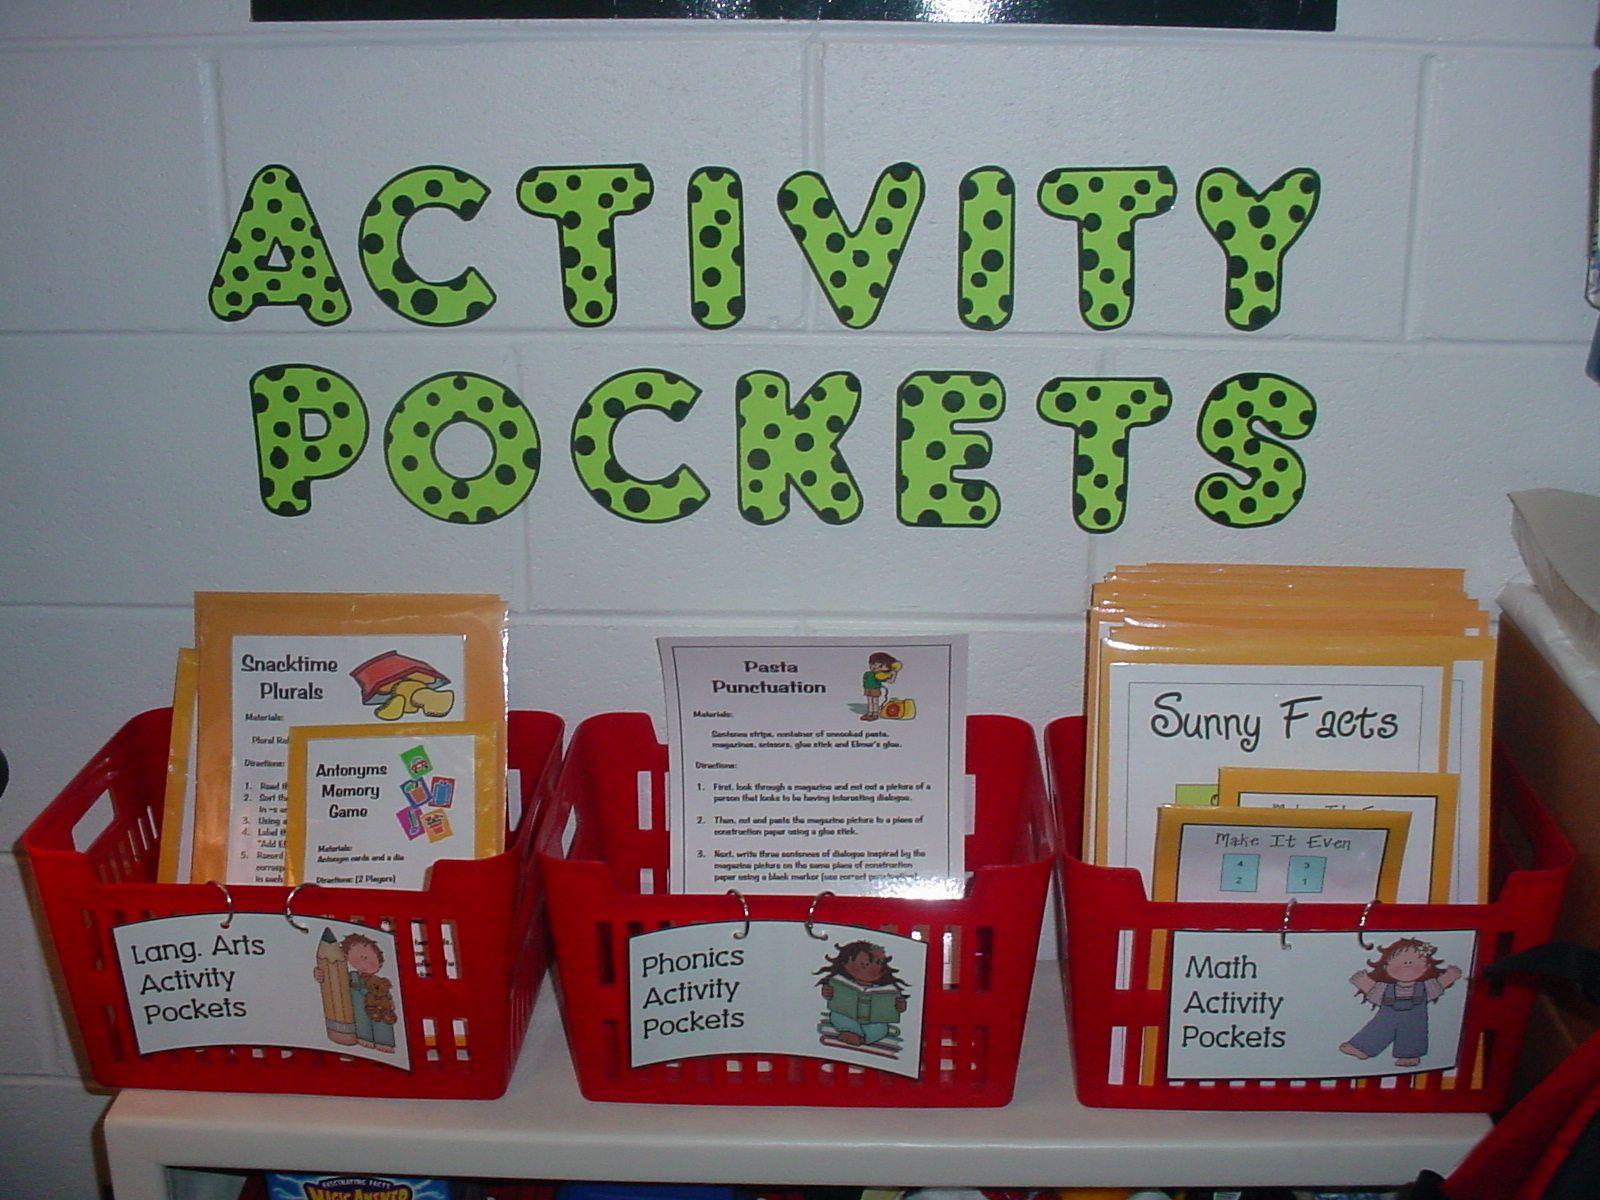 Free Language Arts Pocket Activities Adjectives Sentence